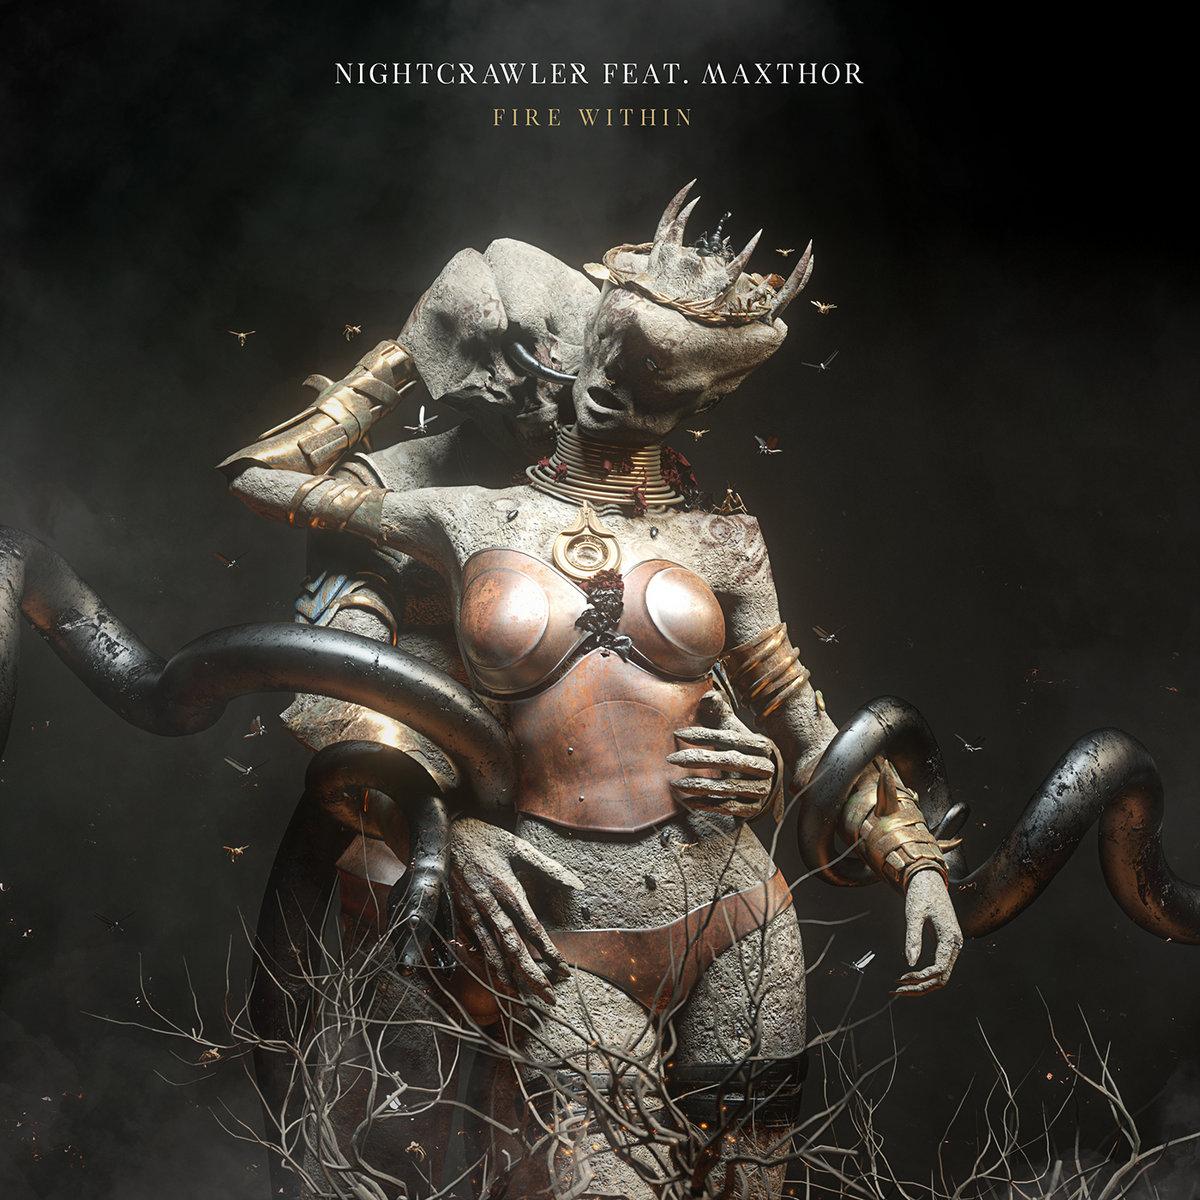 Nightcrawler Fire Within - Nightcrawler releases new MV 'Fire Within (Feat.Maxthor)'